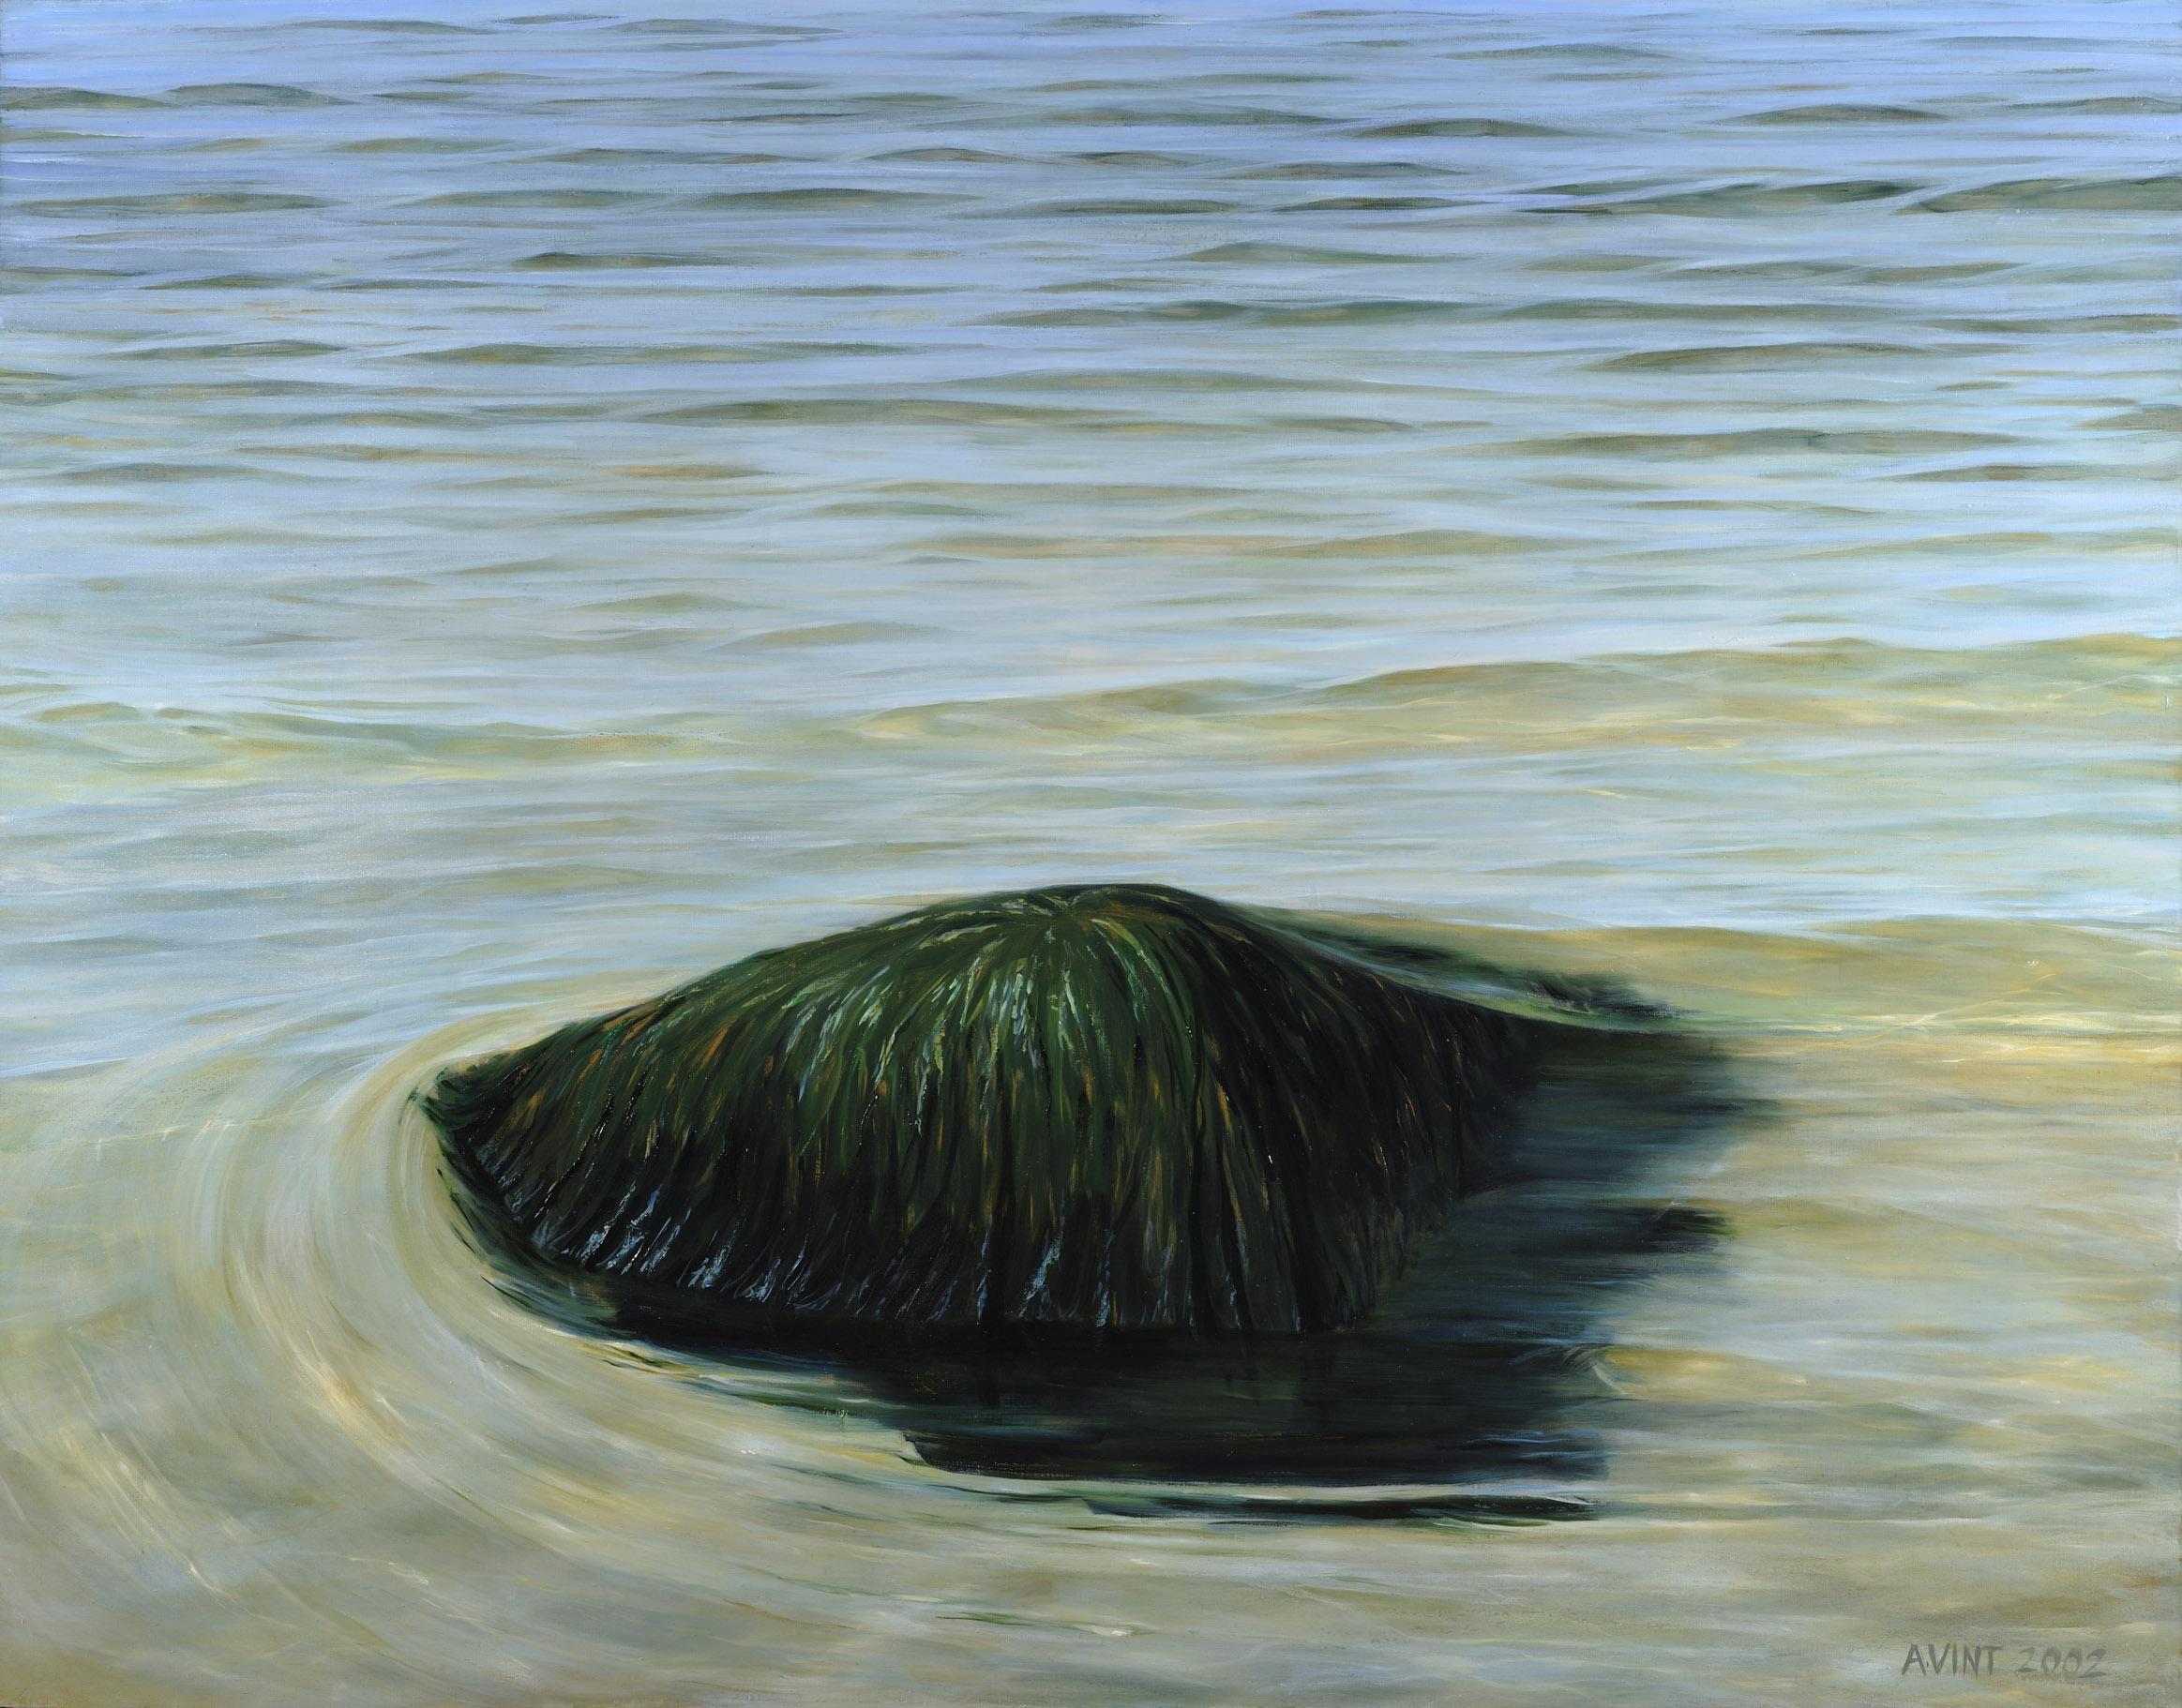 006  stone in coastal water 2000 oil on canvas 150 x 175cm kivi rannavees.jpg